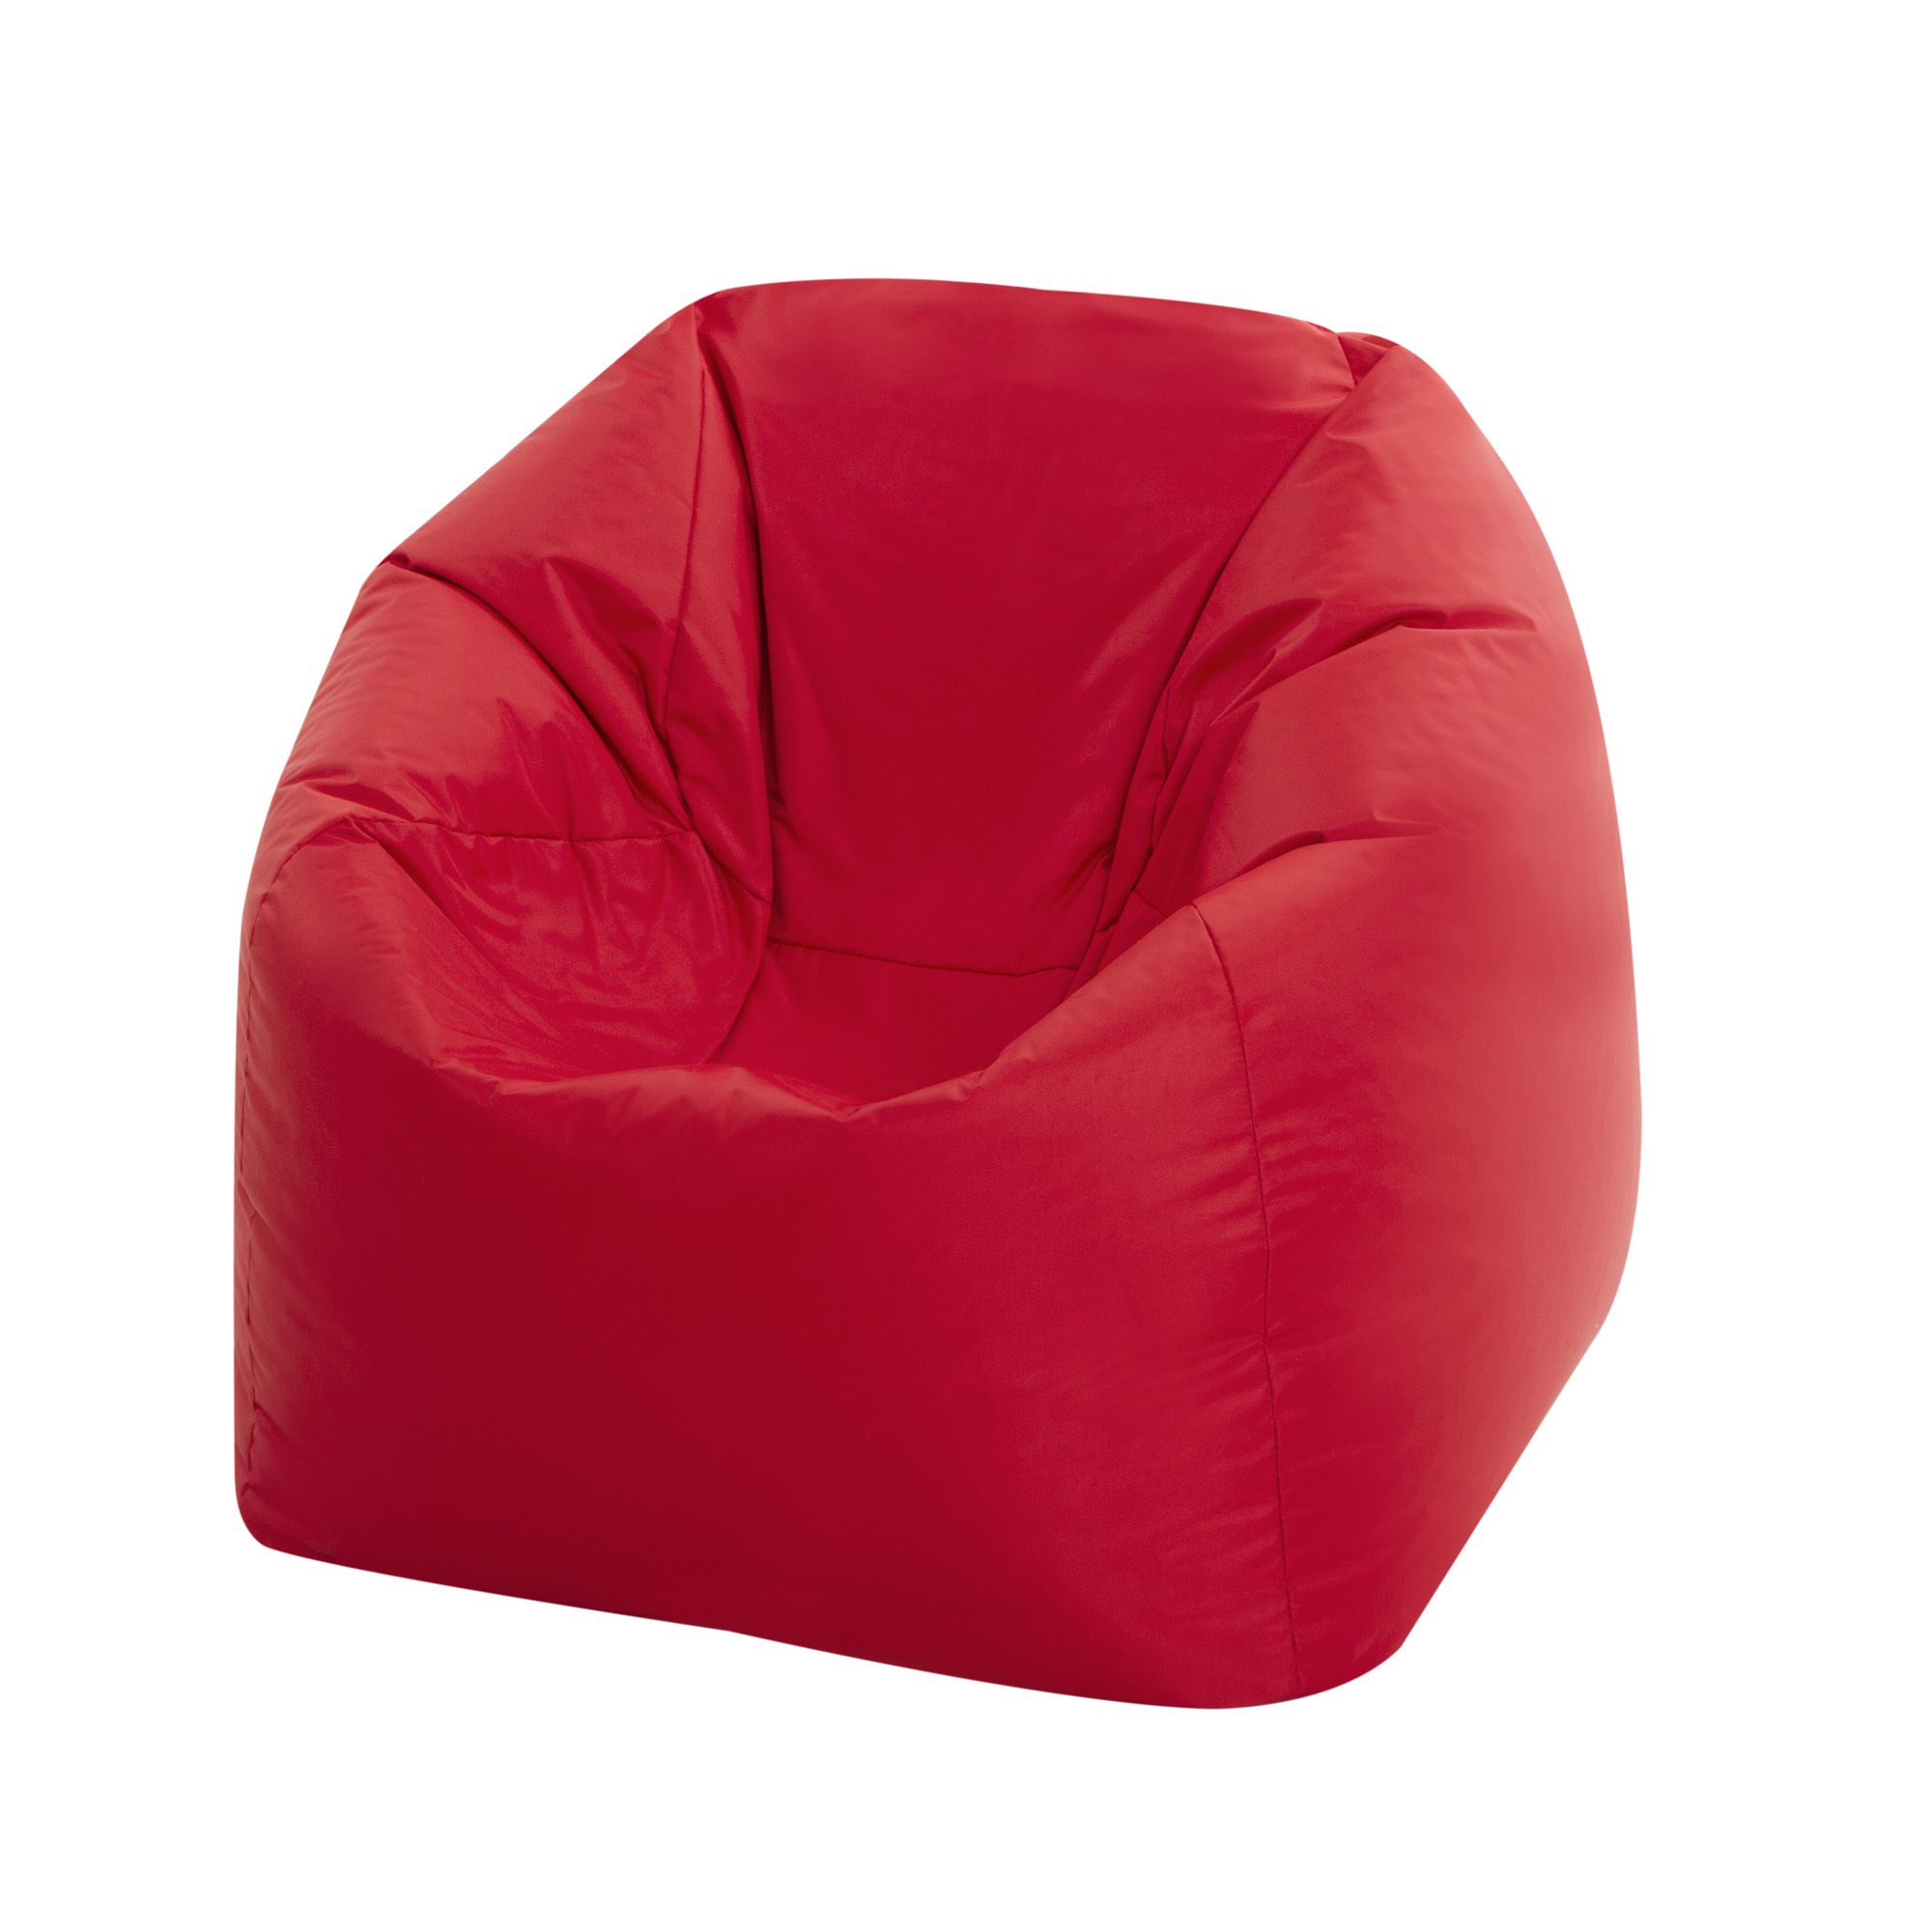 Eden-New-Nursery-Beanbag-red-300dpi-2